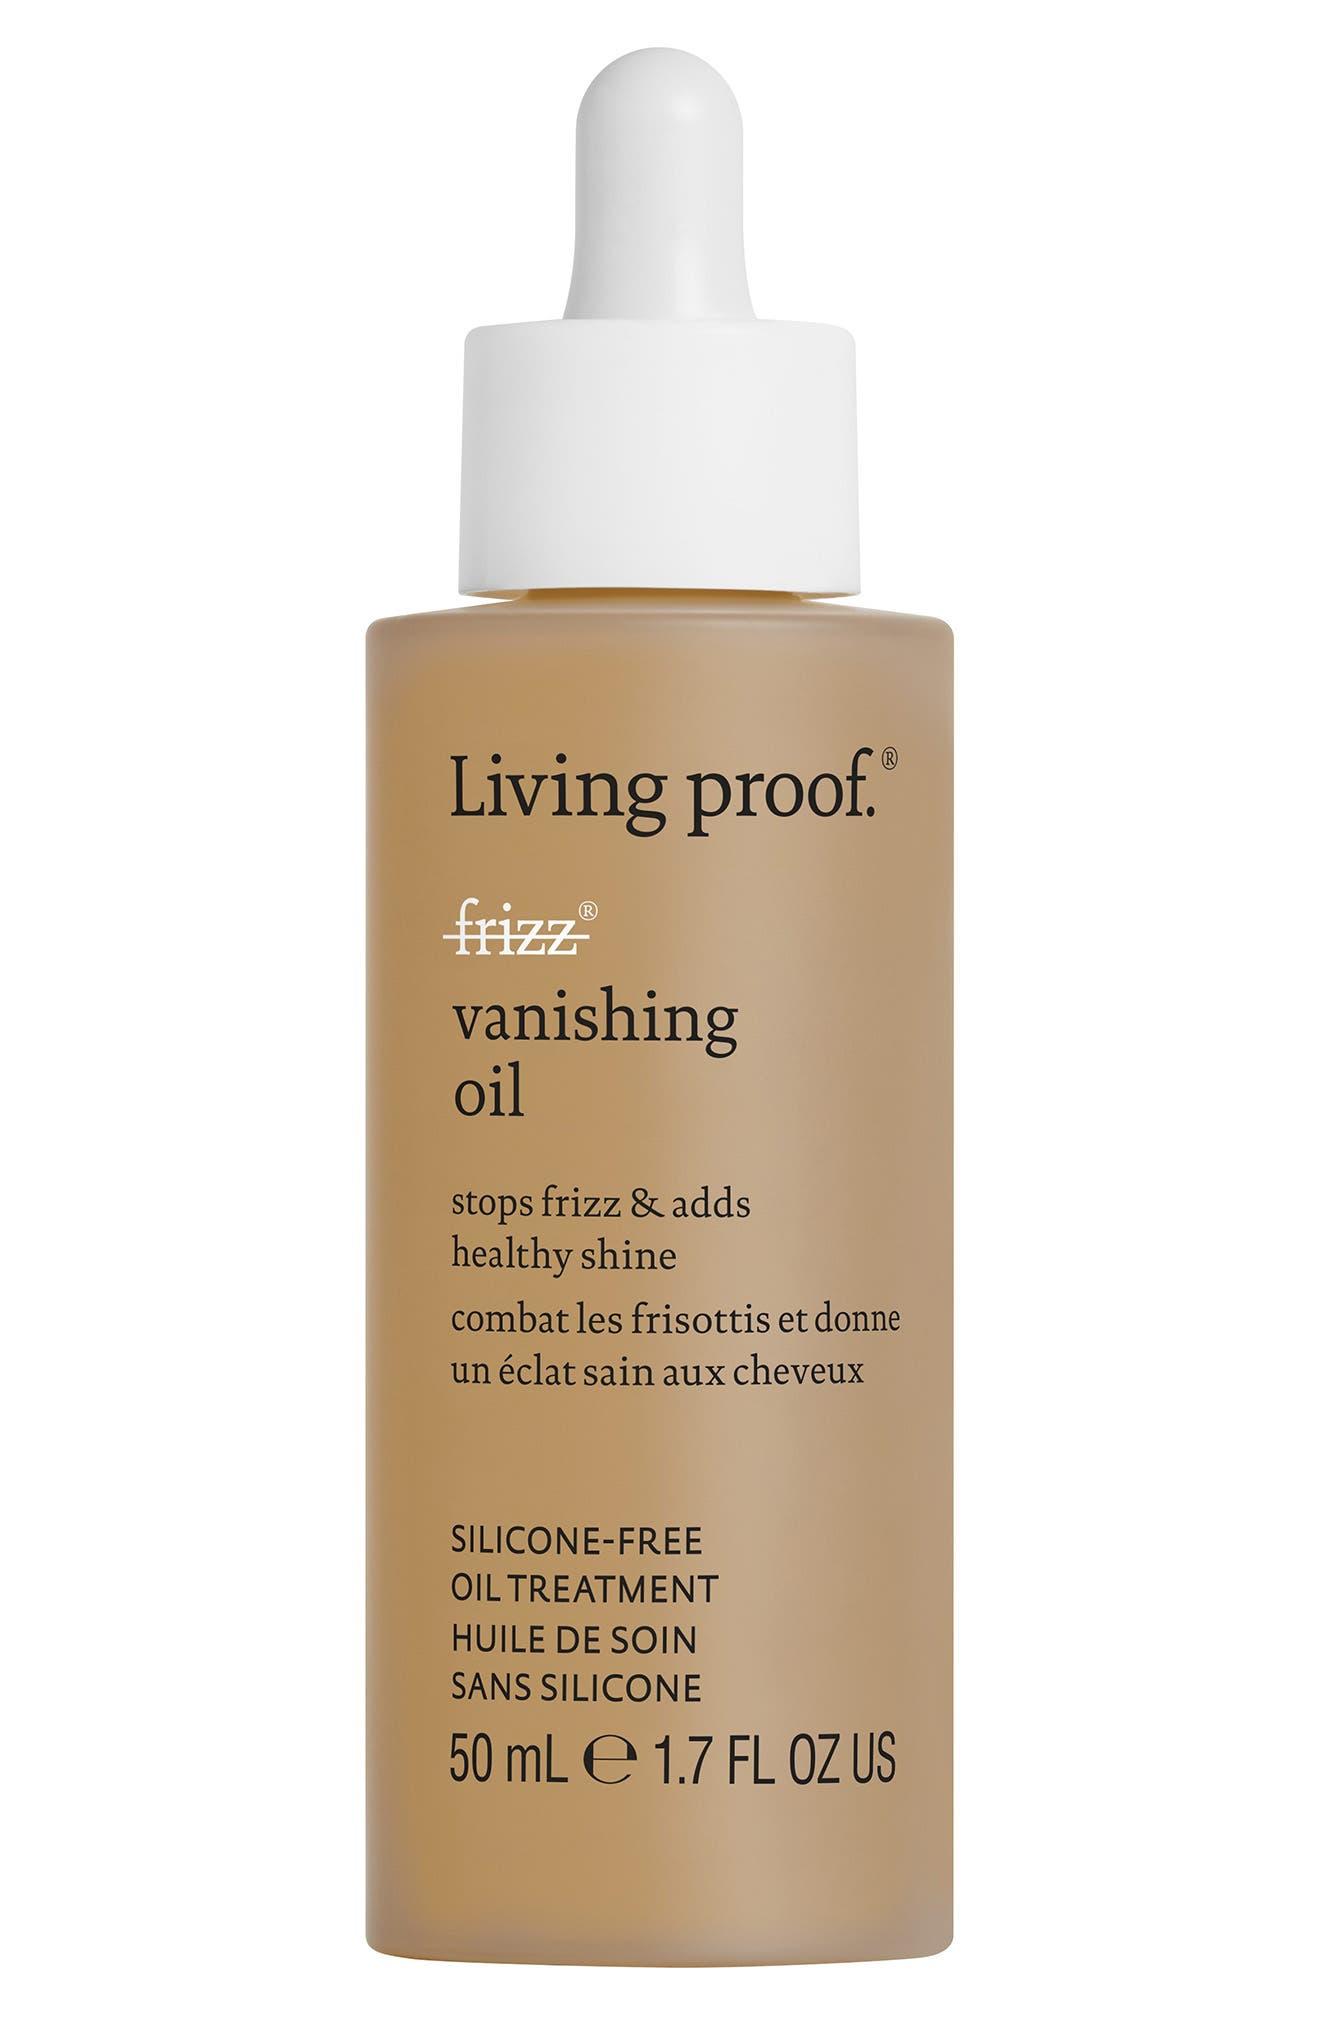 Living Proof No Frizz Vanishing Oil